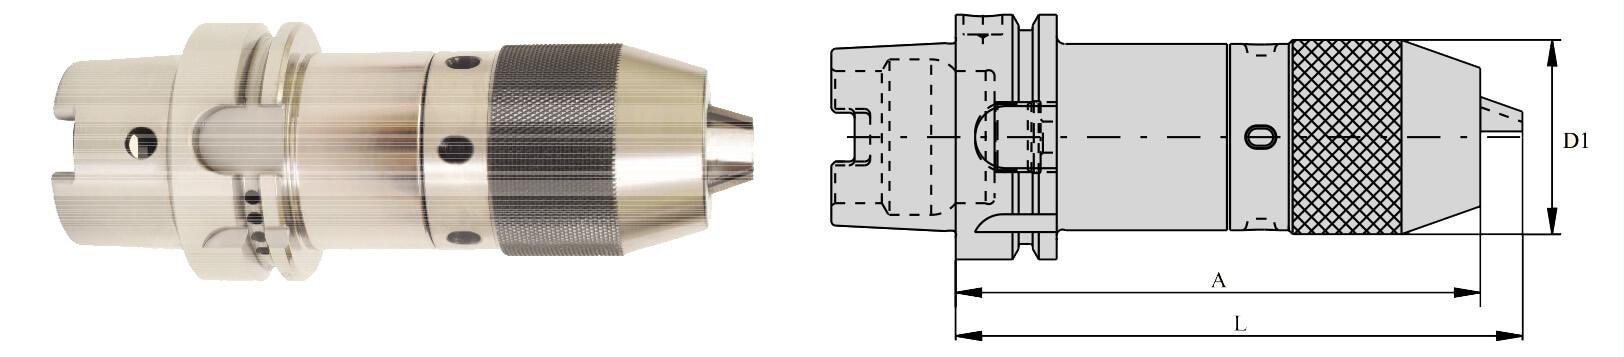 HSK-A 50 NCDC141 125 Integral Drill Chuck